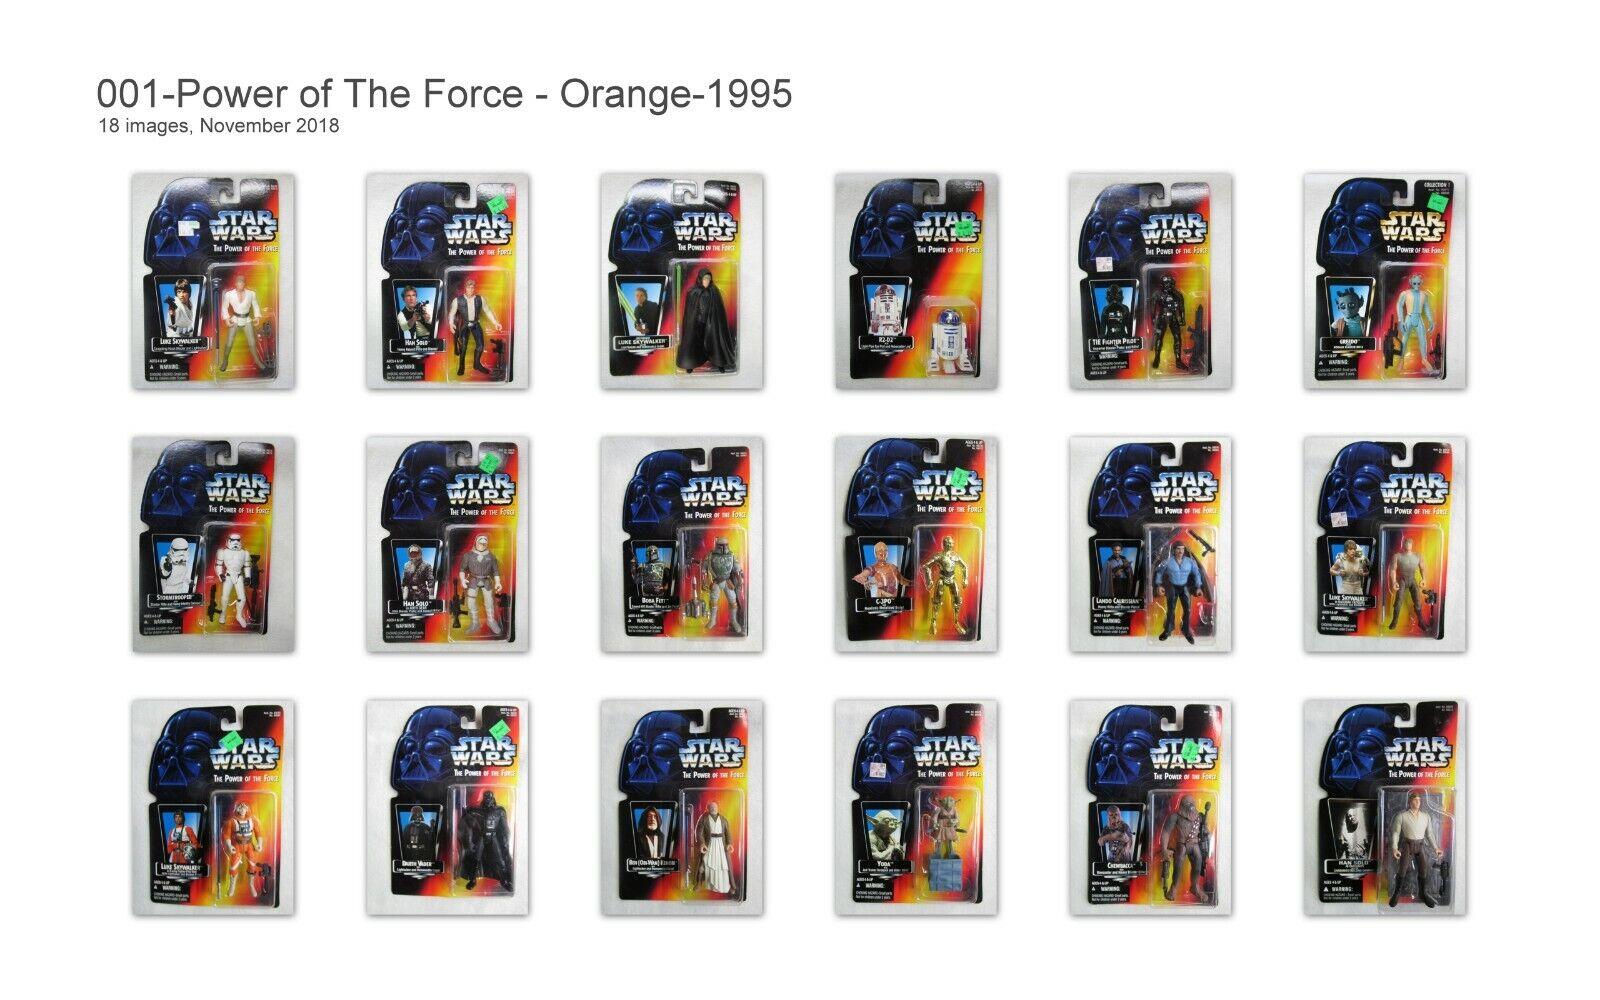 Star Wars Power Of The Force Lot 1995 Originals - 18 Figures NIB